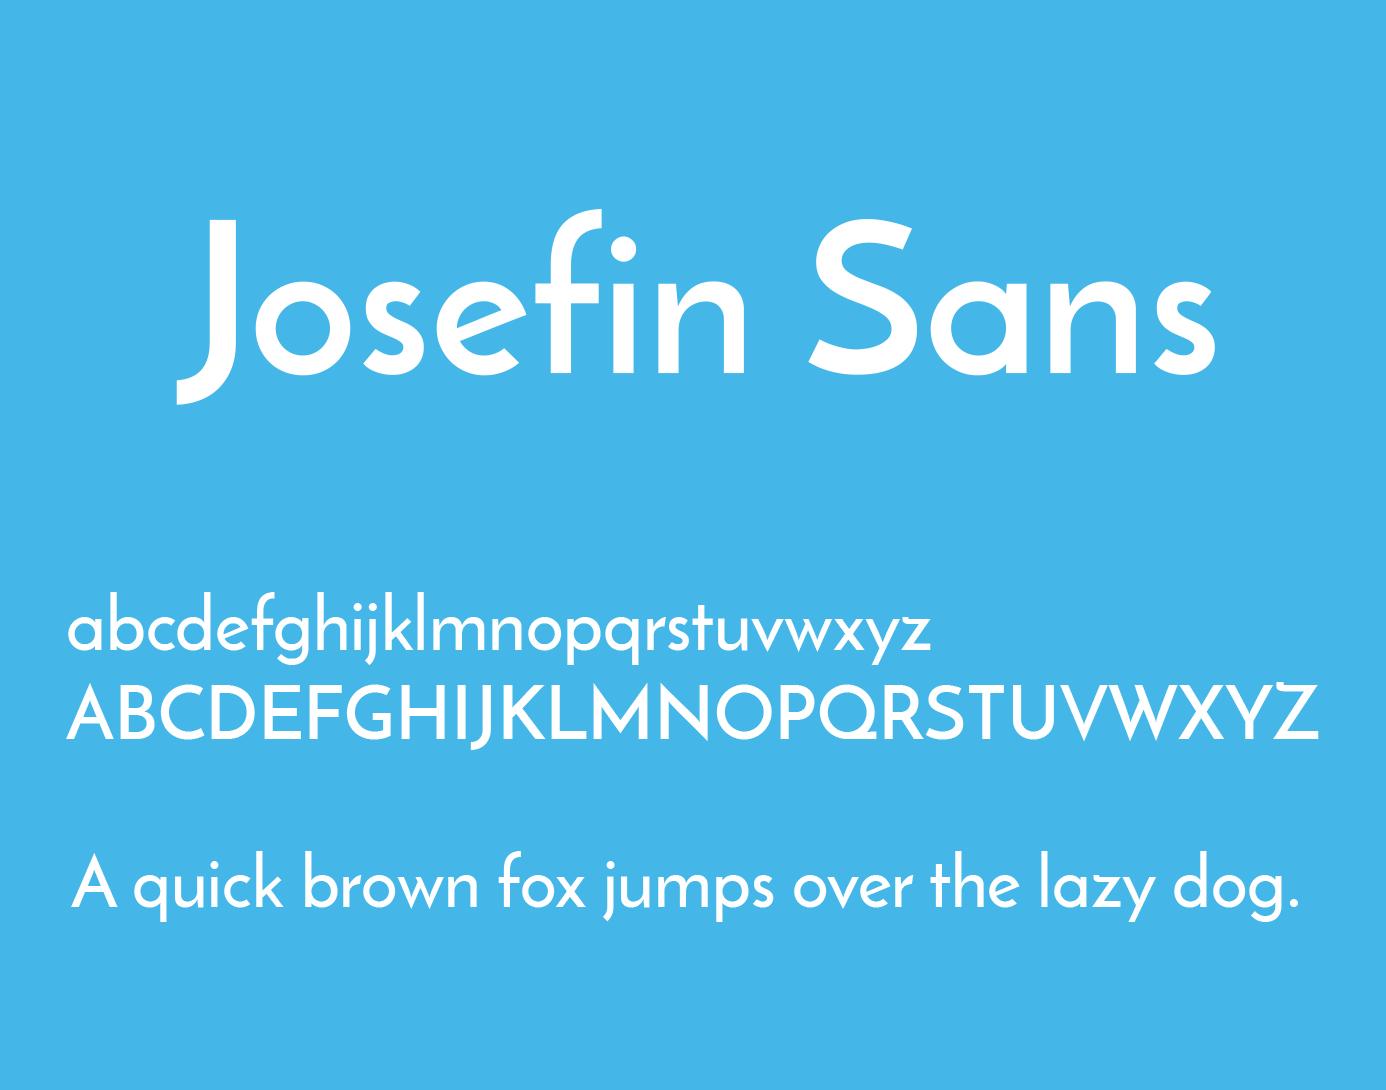 josefin-sans-font